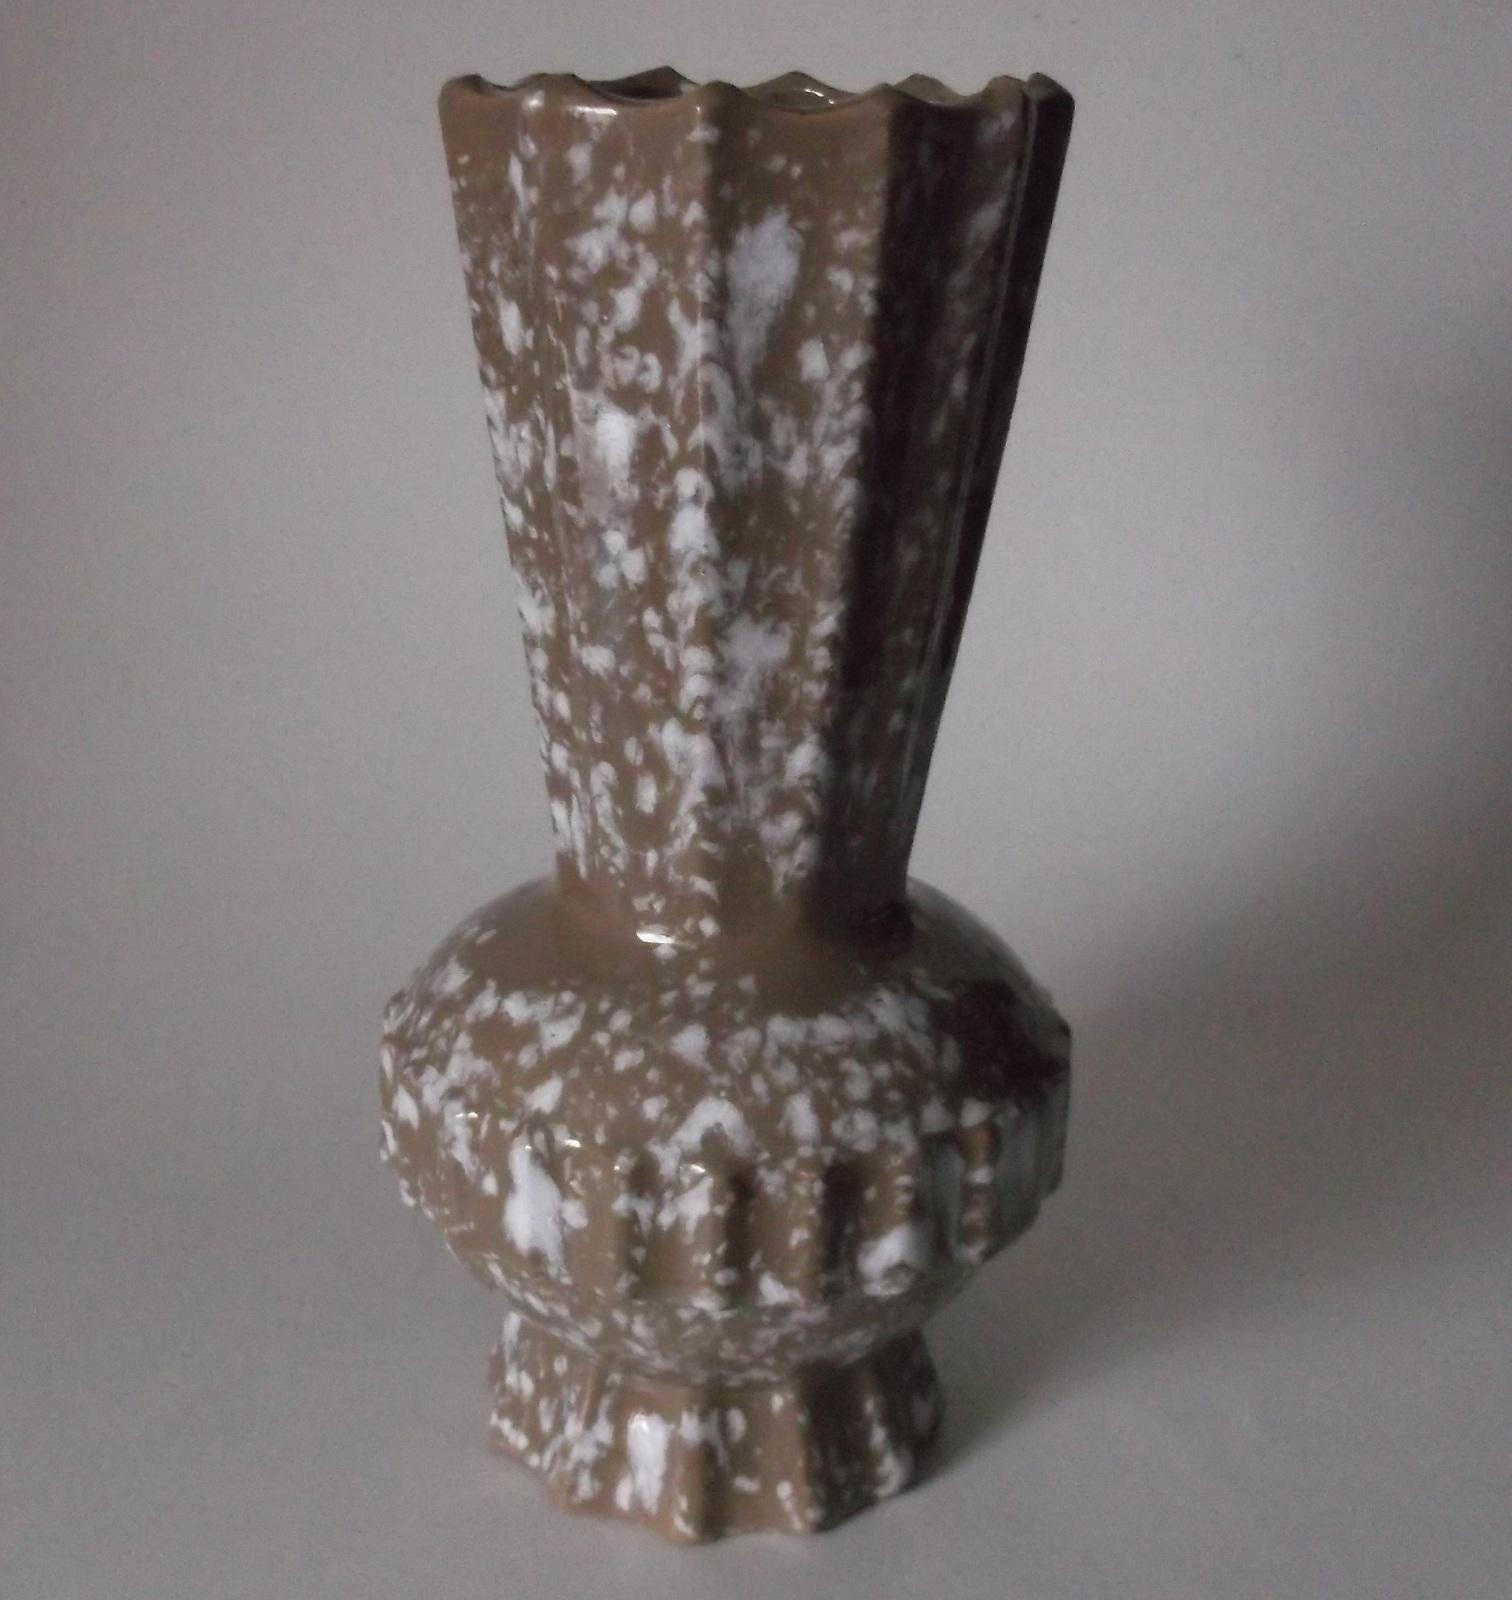 Mid century modern vase vintage brown white and 11 similar items reviewsmspy